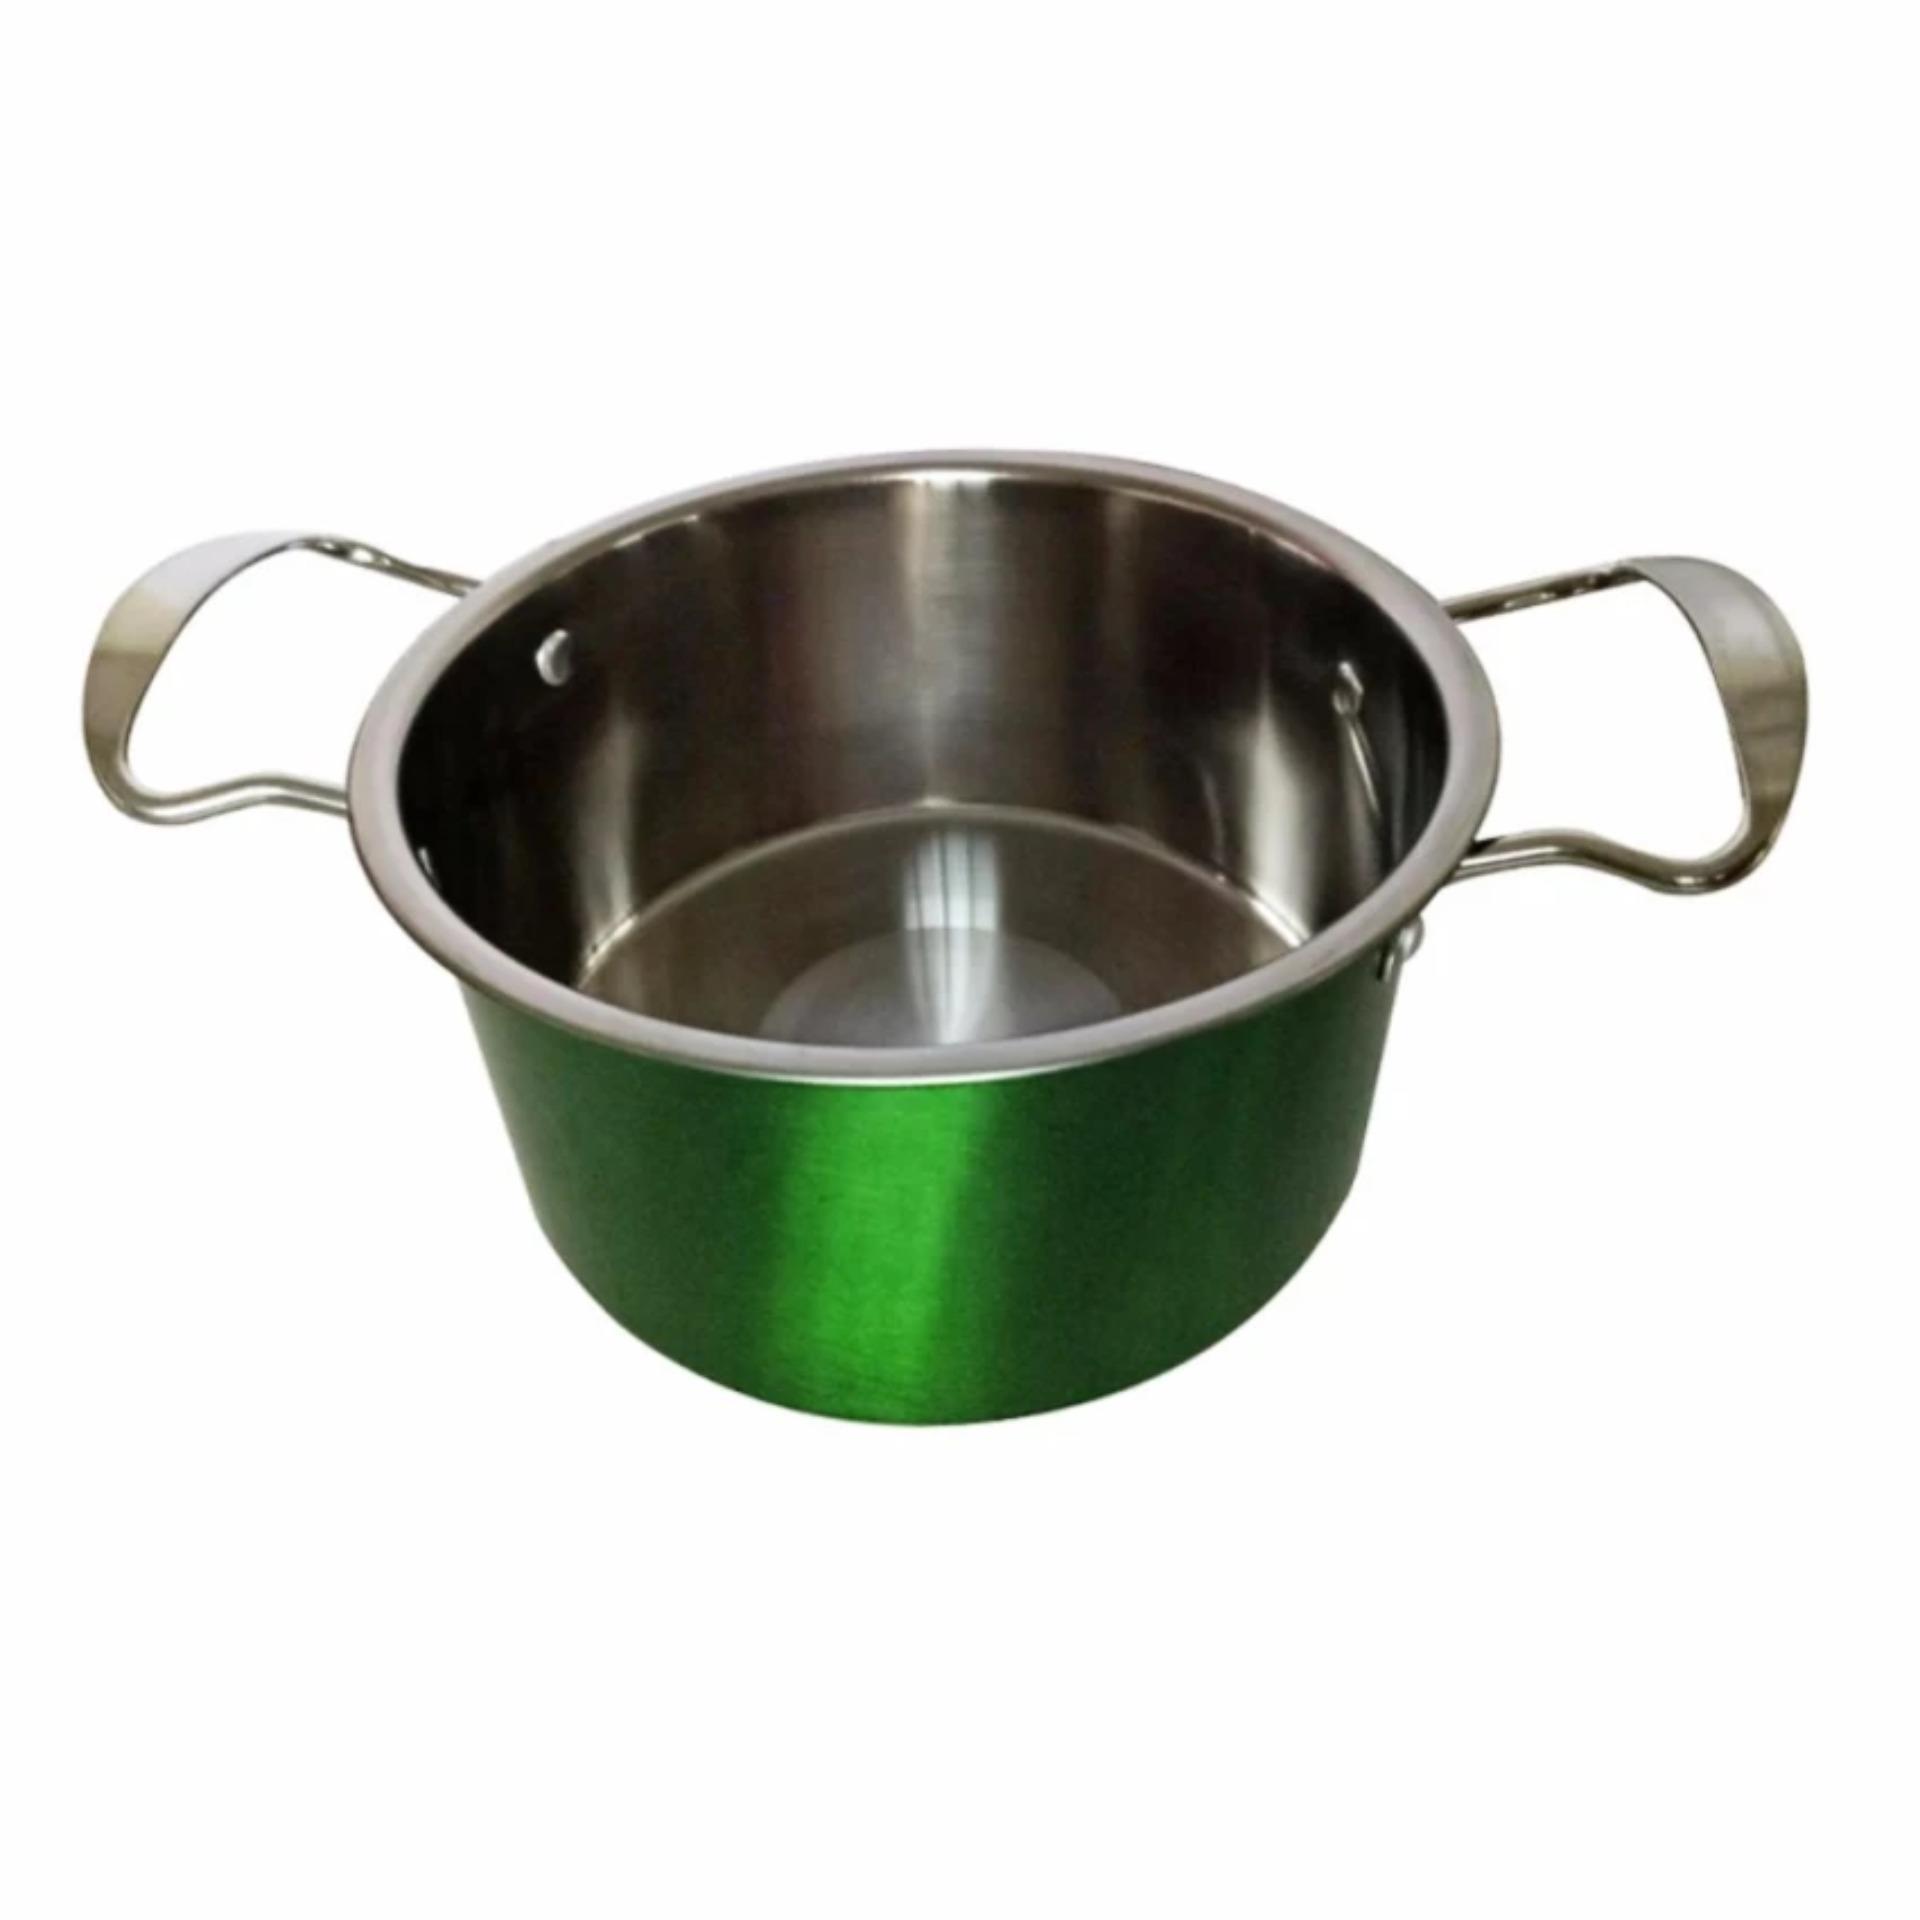 Stock Pot High Quality Kitchenware 3pcs Set